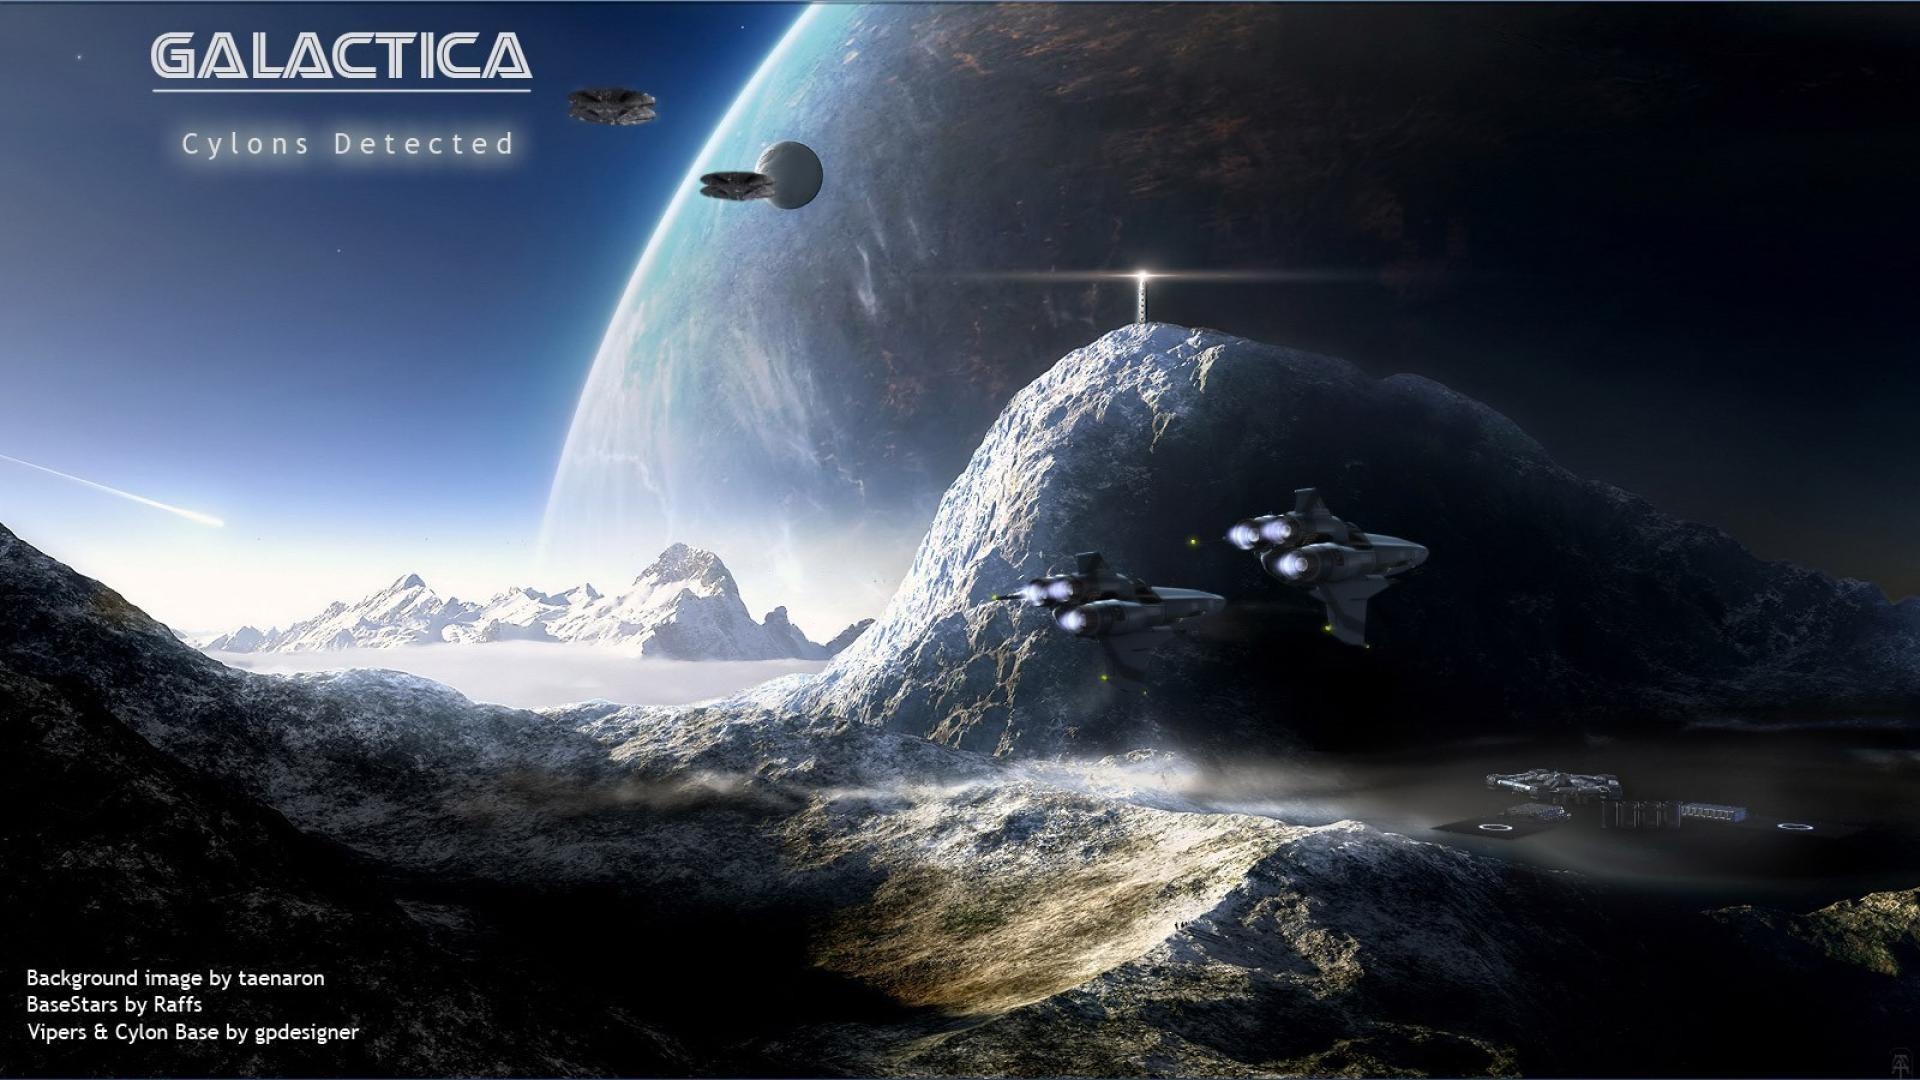 Battlestar galactica wallpaper | (63402)